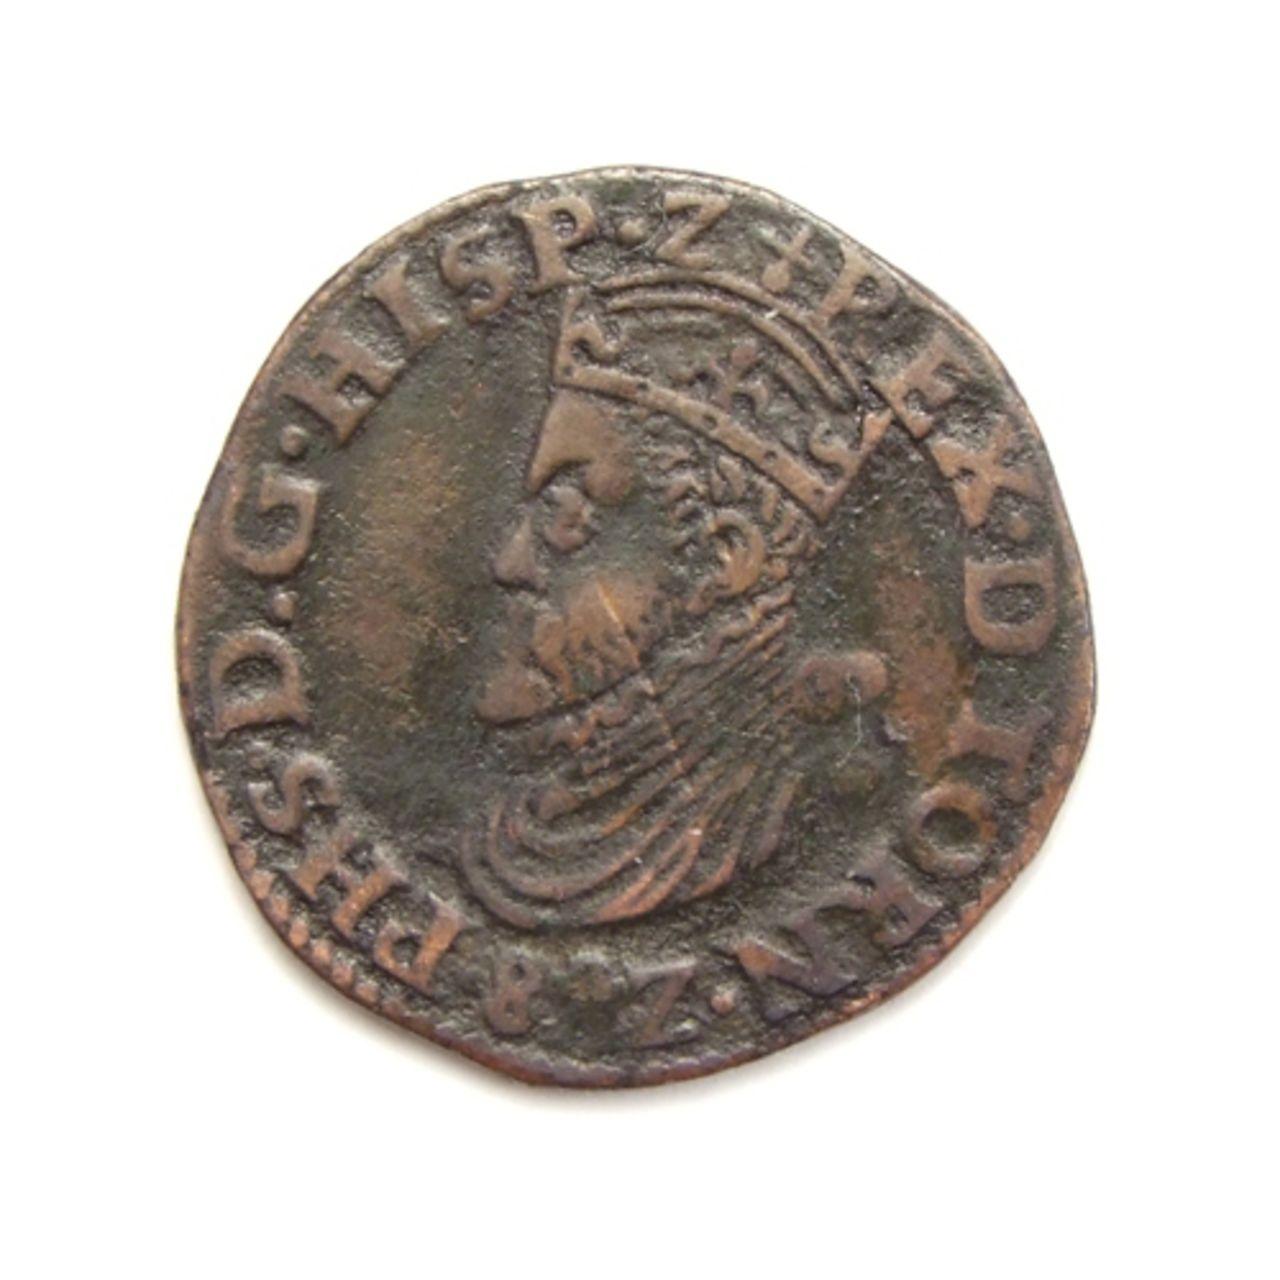 Hertogelijke Oord o Liard 1582. Felipe II. Doornik (Tournai). Spaanse_nederlanden_doornik_oord_1582_5034_0